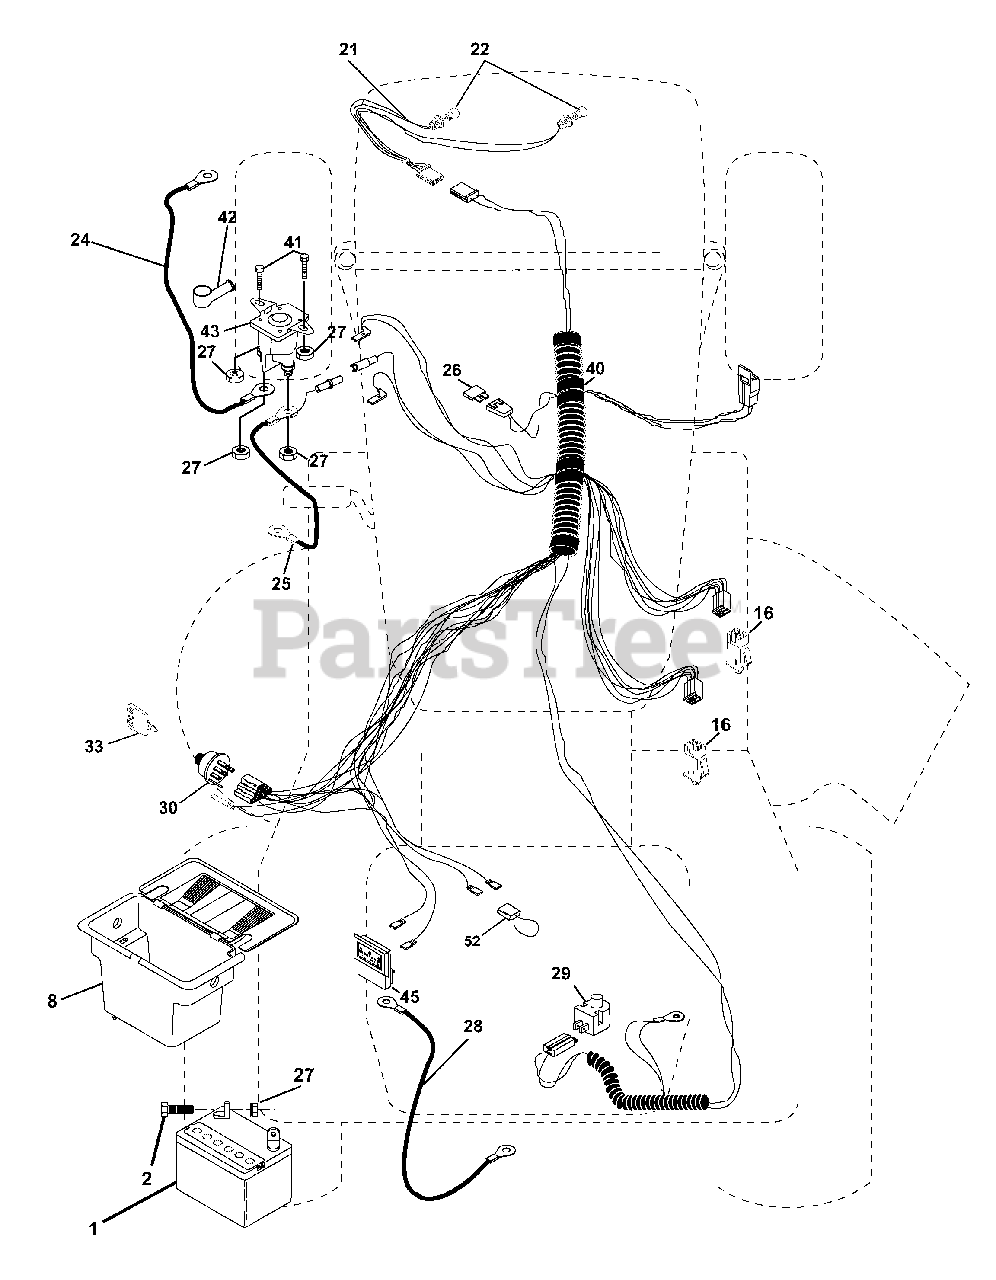 Wiring Diagram For Poulan Lawn Mower